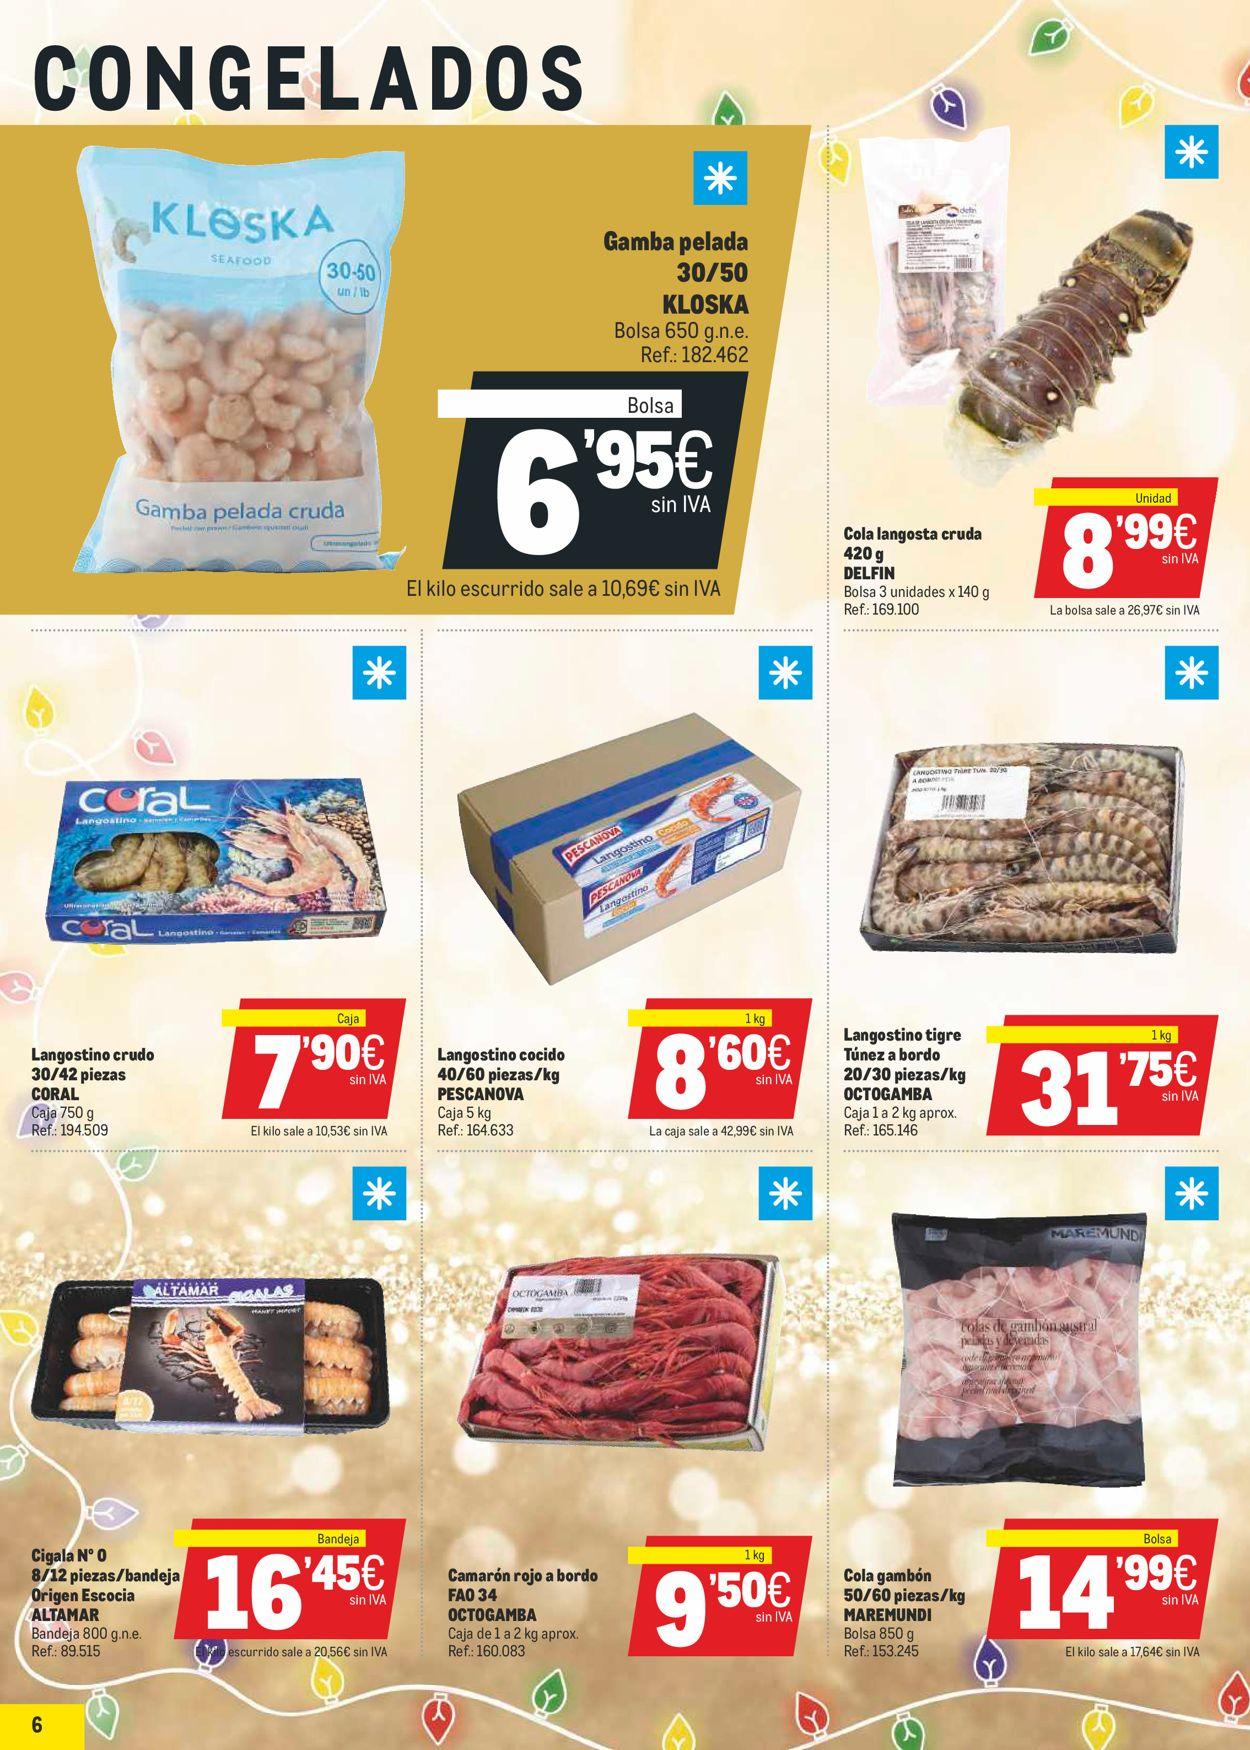 Makro La Navidad Mas Gastro 2020 Folleto - 17.12-05.01.2021 (Página 6)